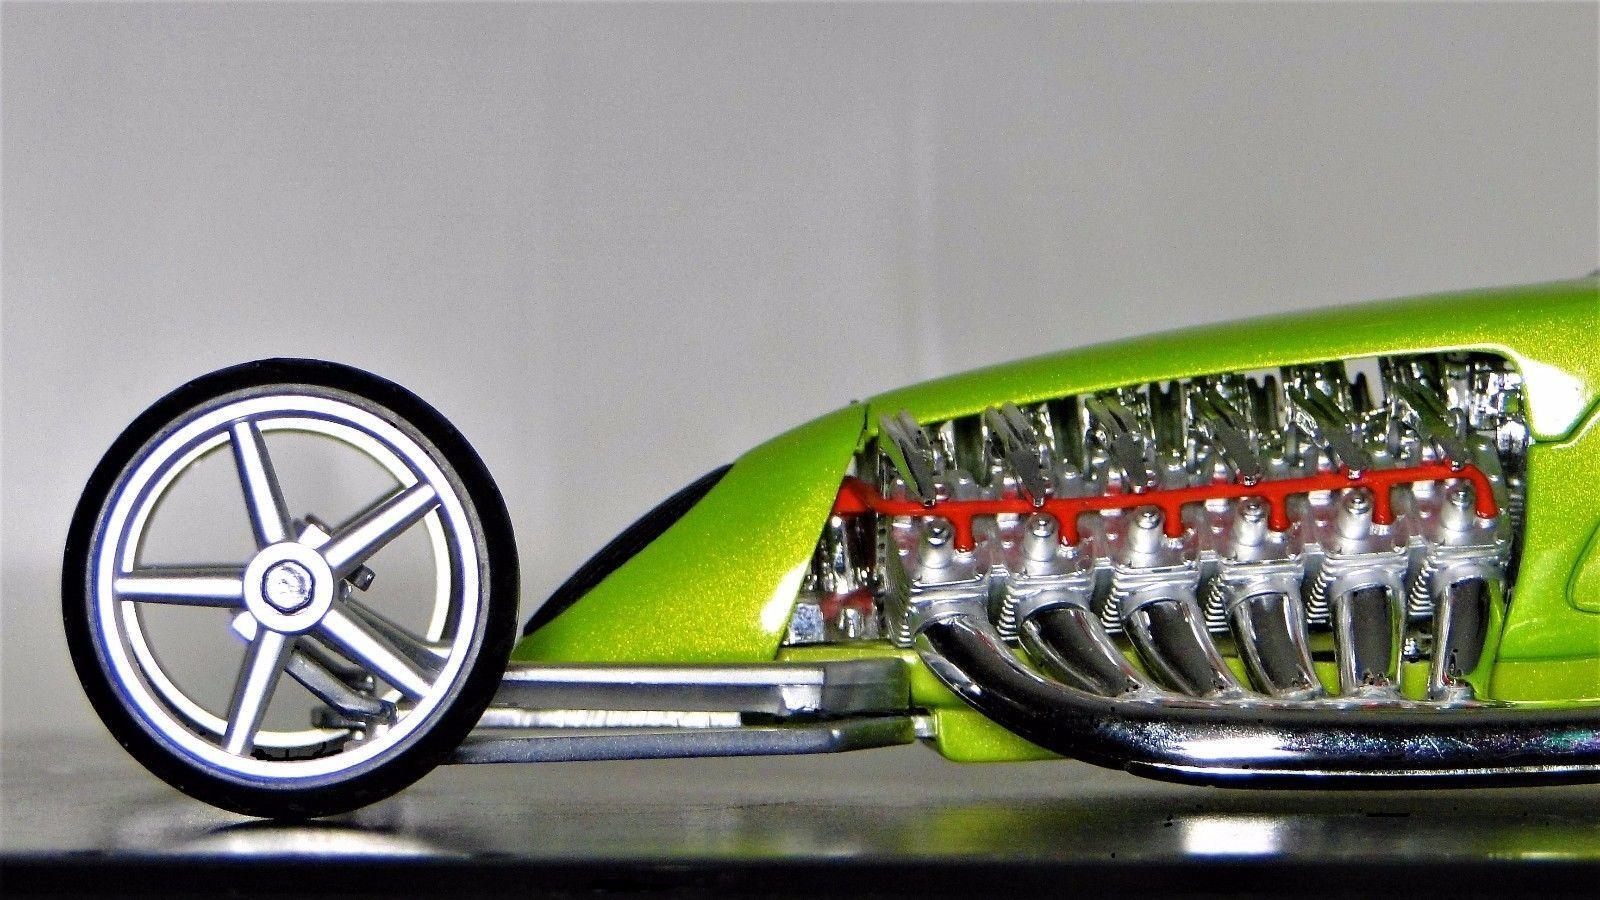 Dragster varm T Rod Drag Race bil 24 Sport 12 modellllerlerl 1 Concept 18 1933 årgång